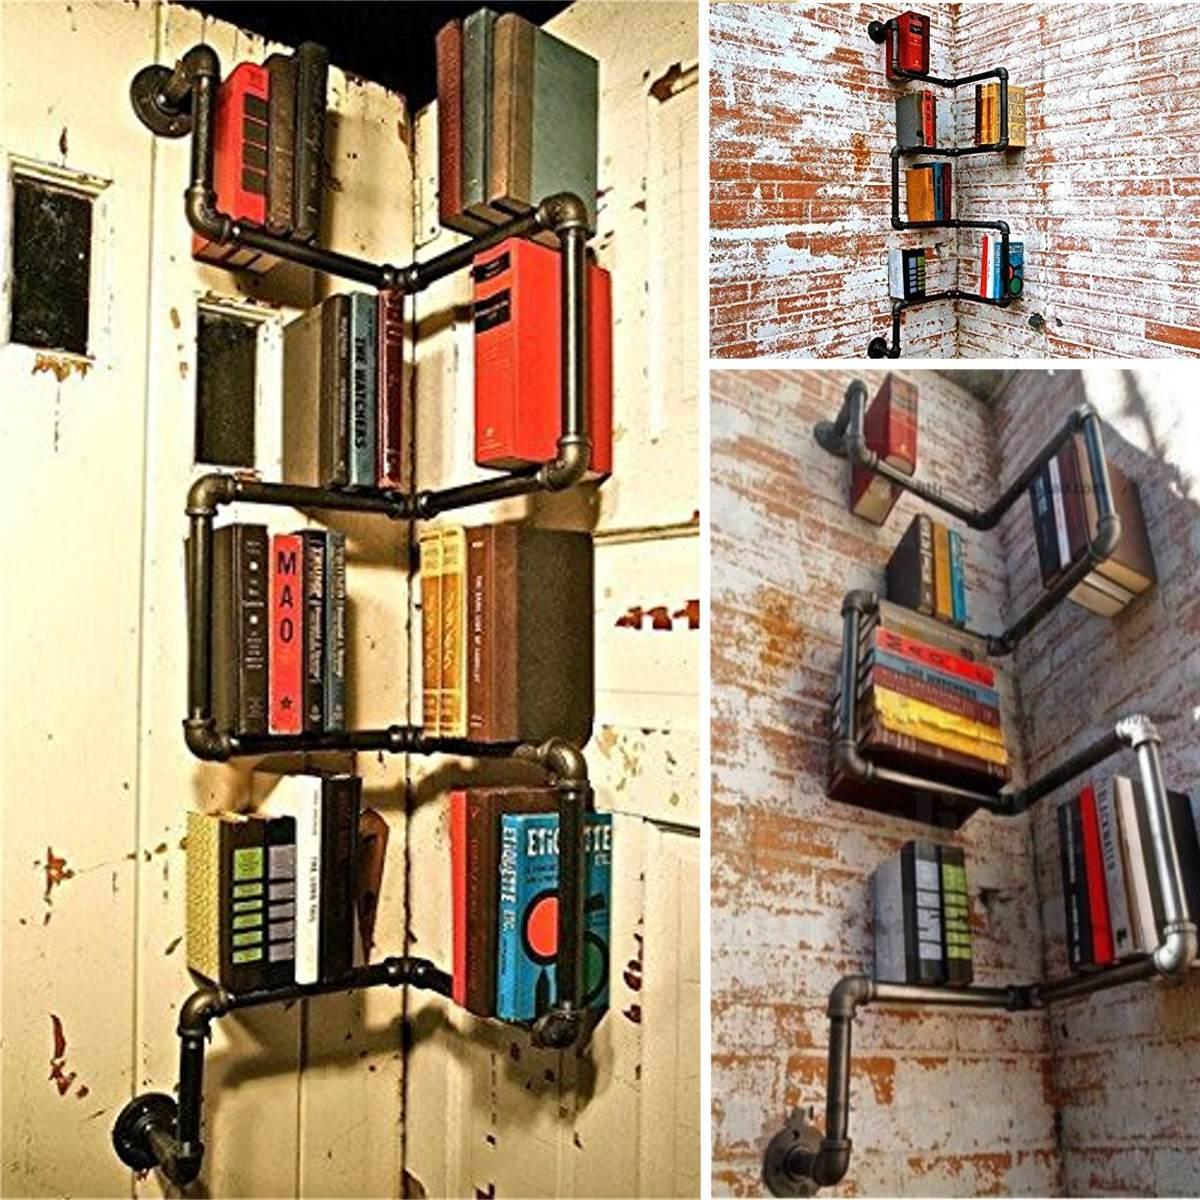 Industrial Urban Gaya Pipa Rak Penyimpanan Rak Buku Dinding Mount DIY Hitam Besi Dekorasi